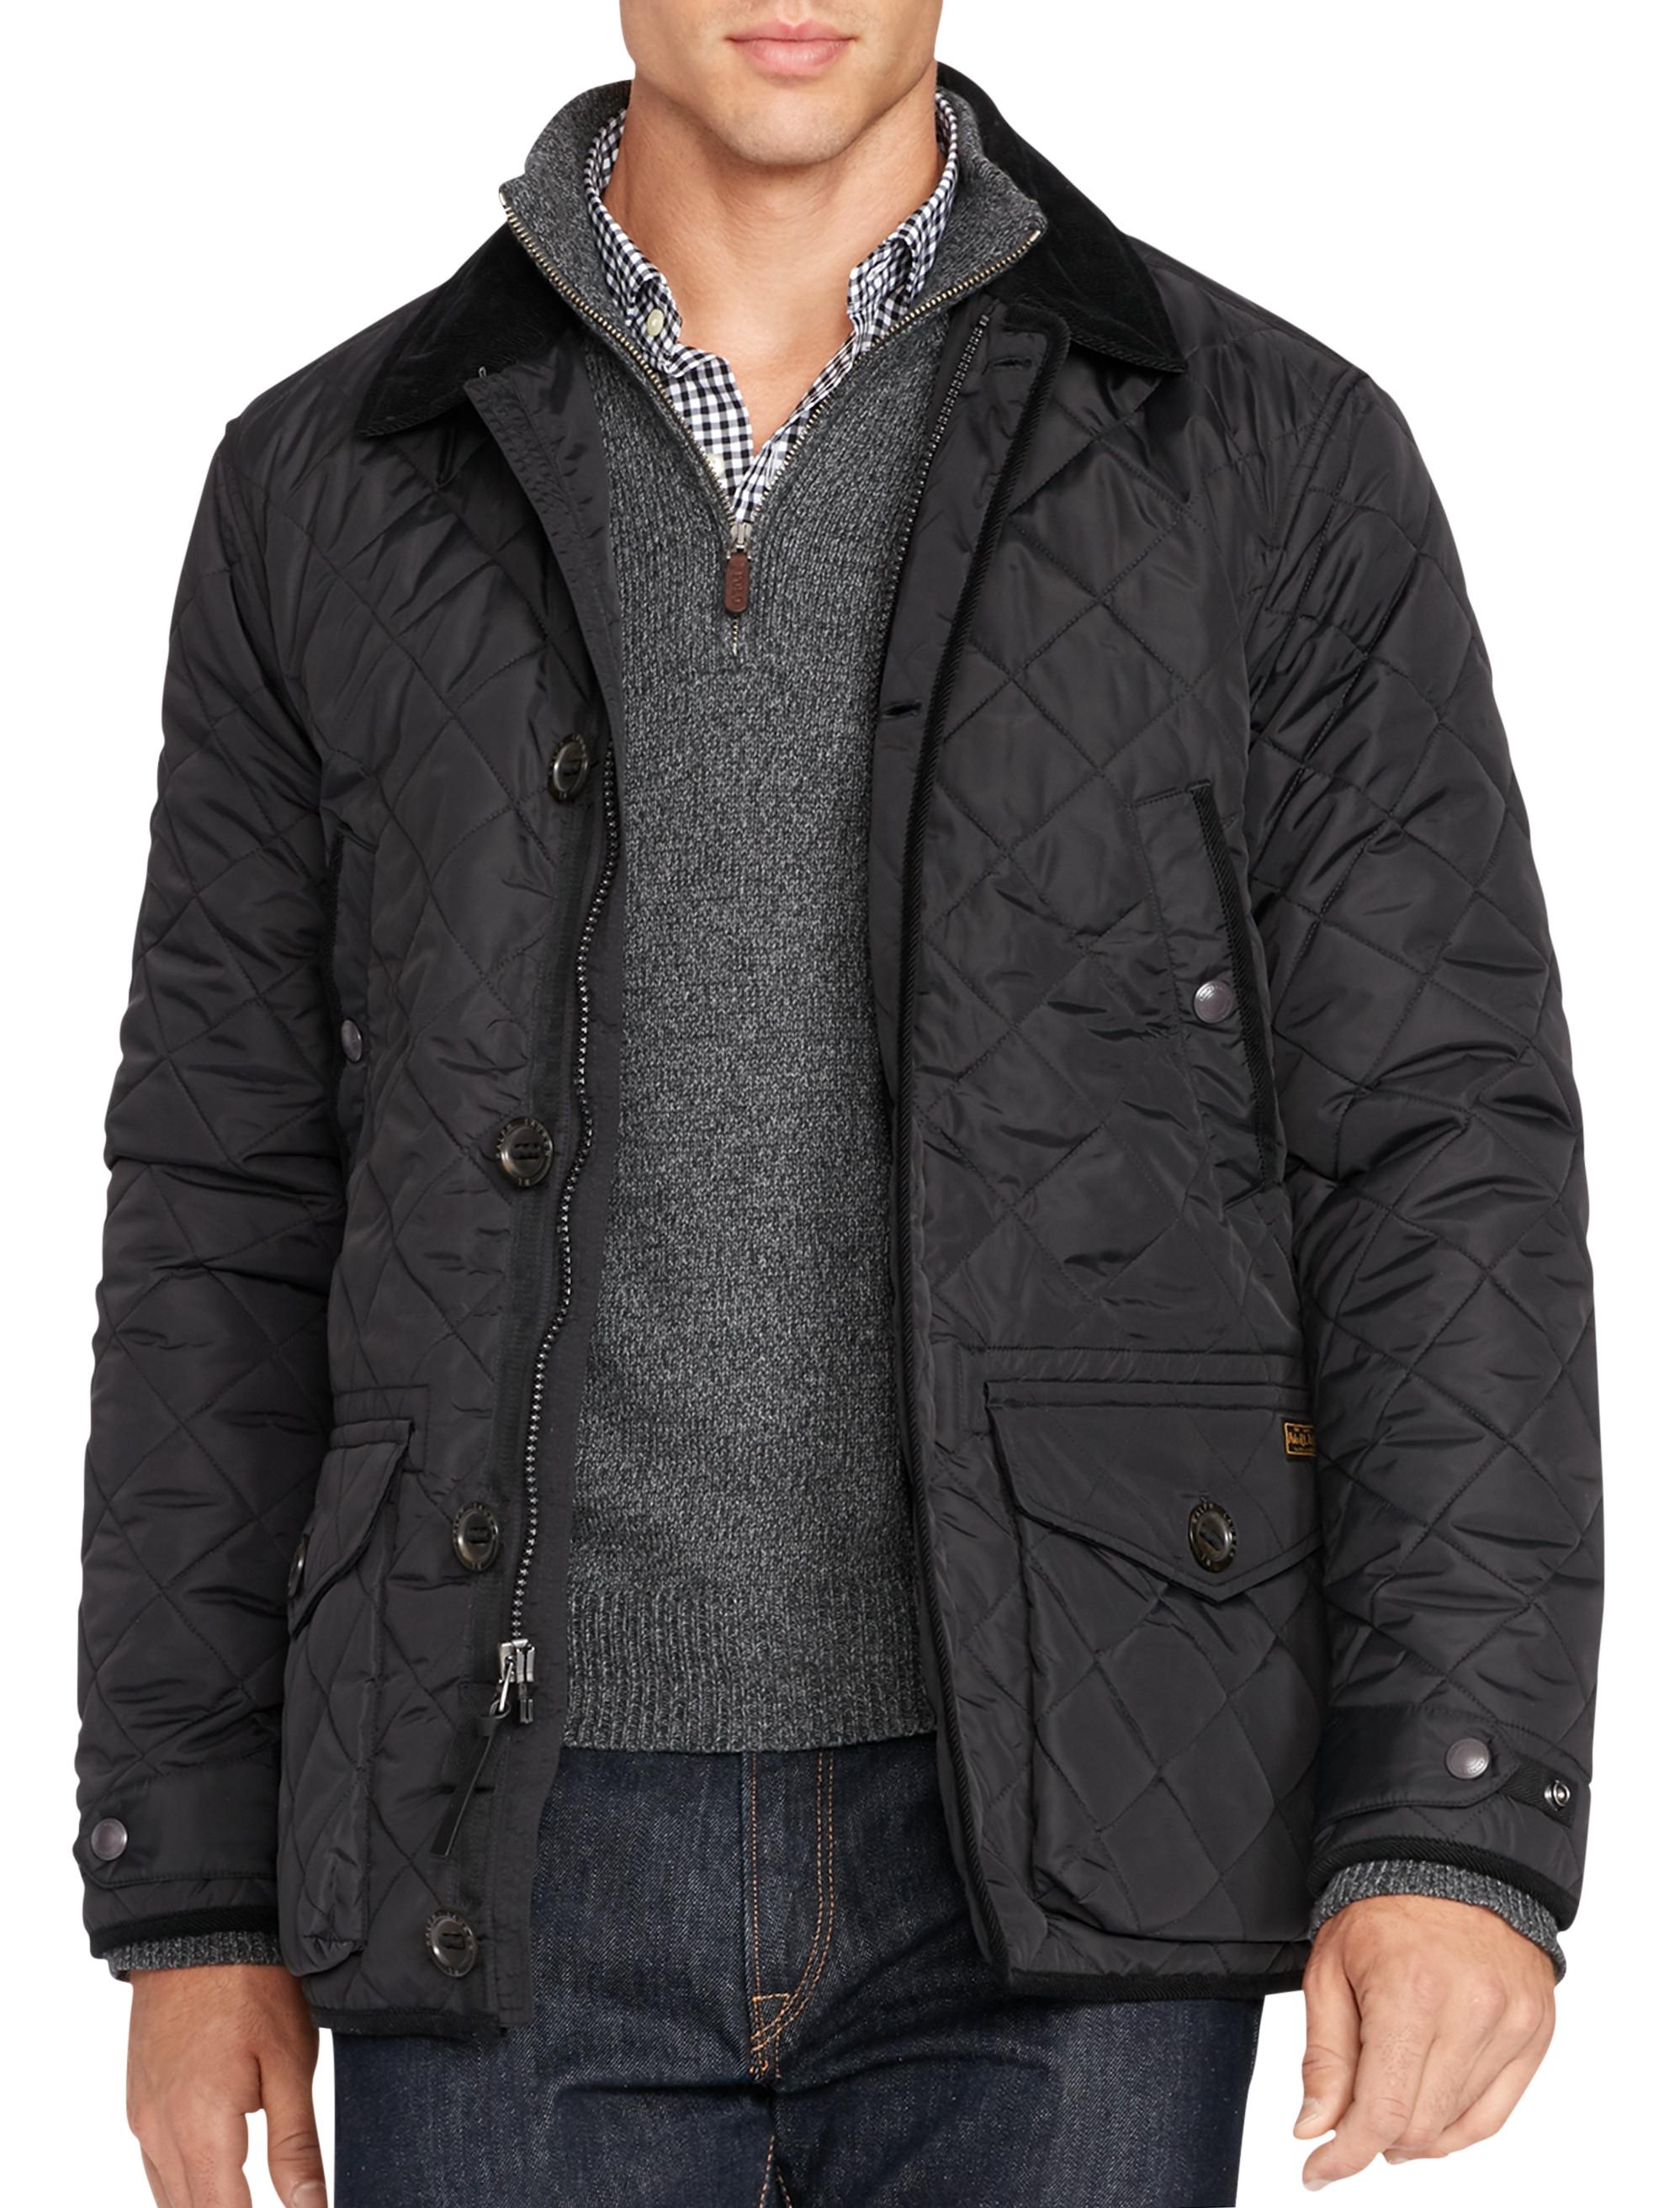 Calvin Klein® Brave Car Coat | Coats & Jackets from Destination XL